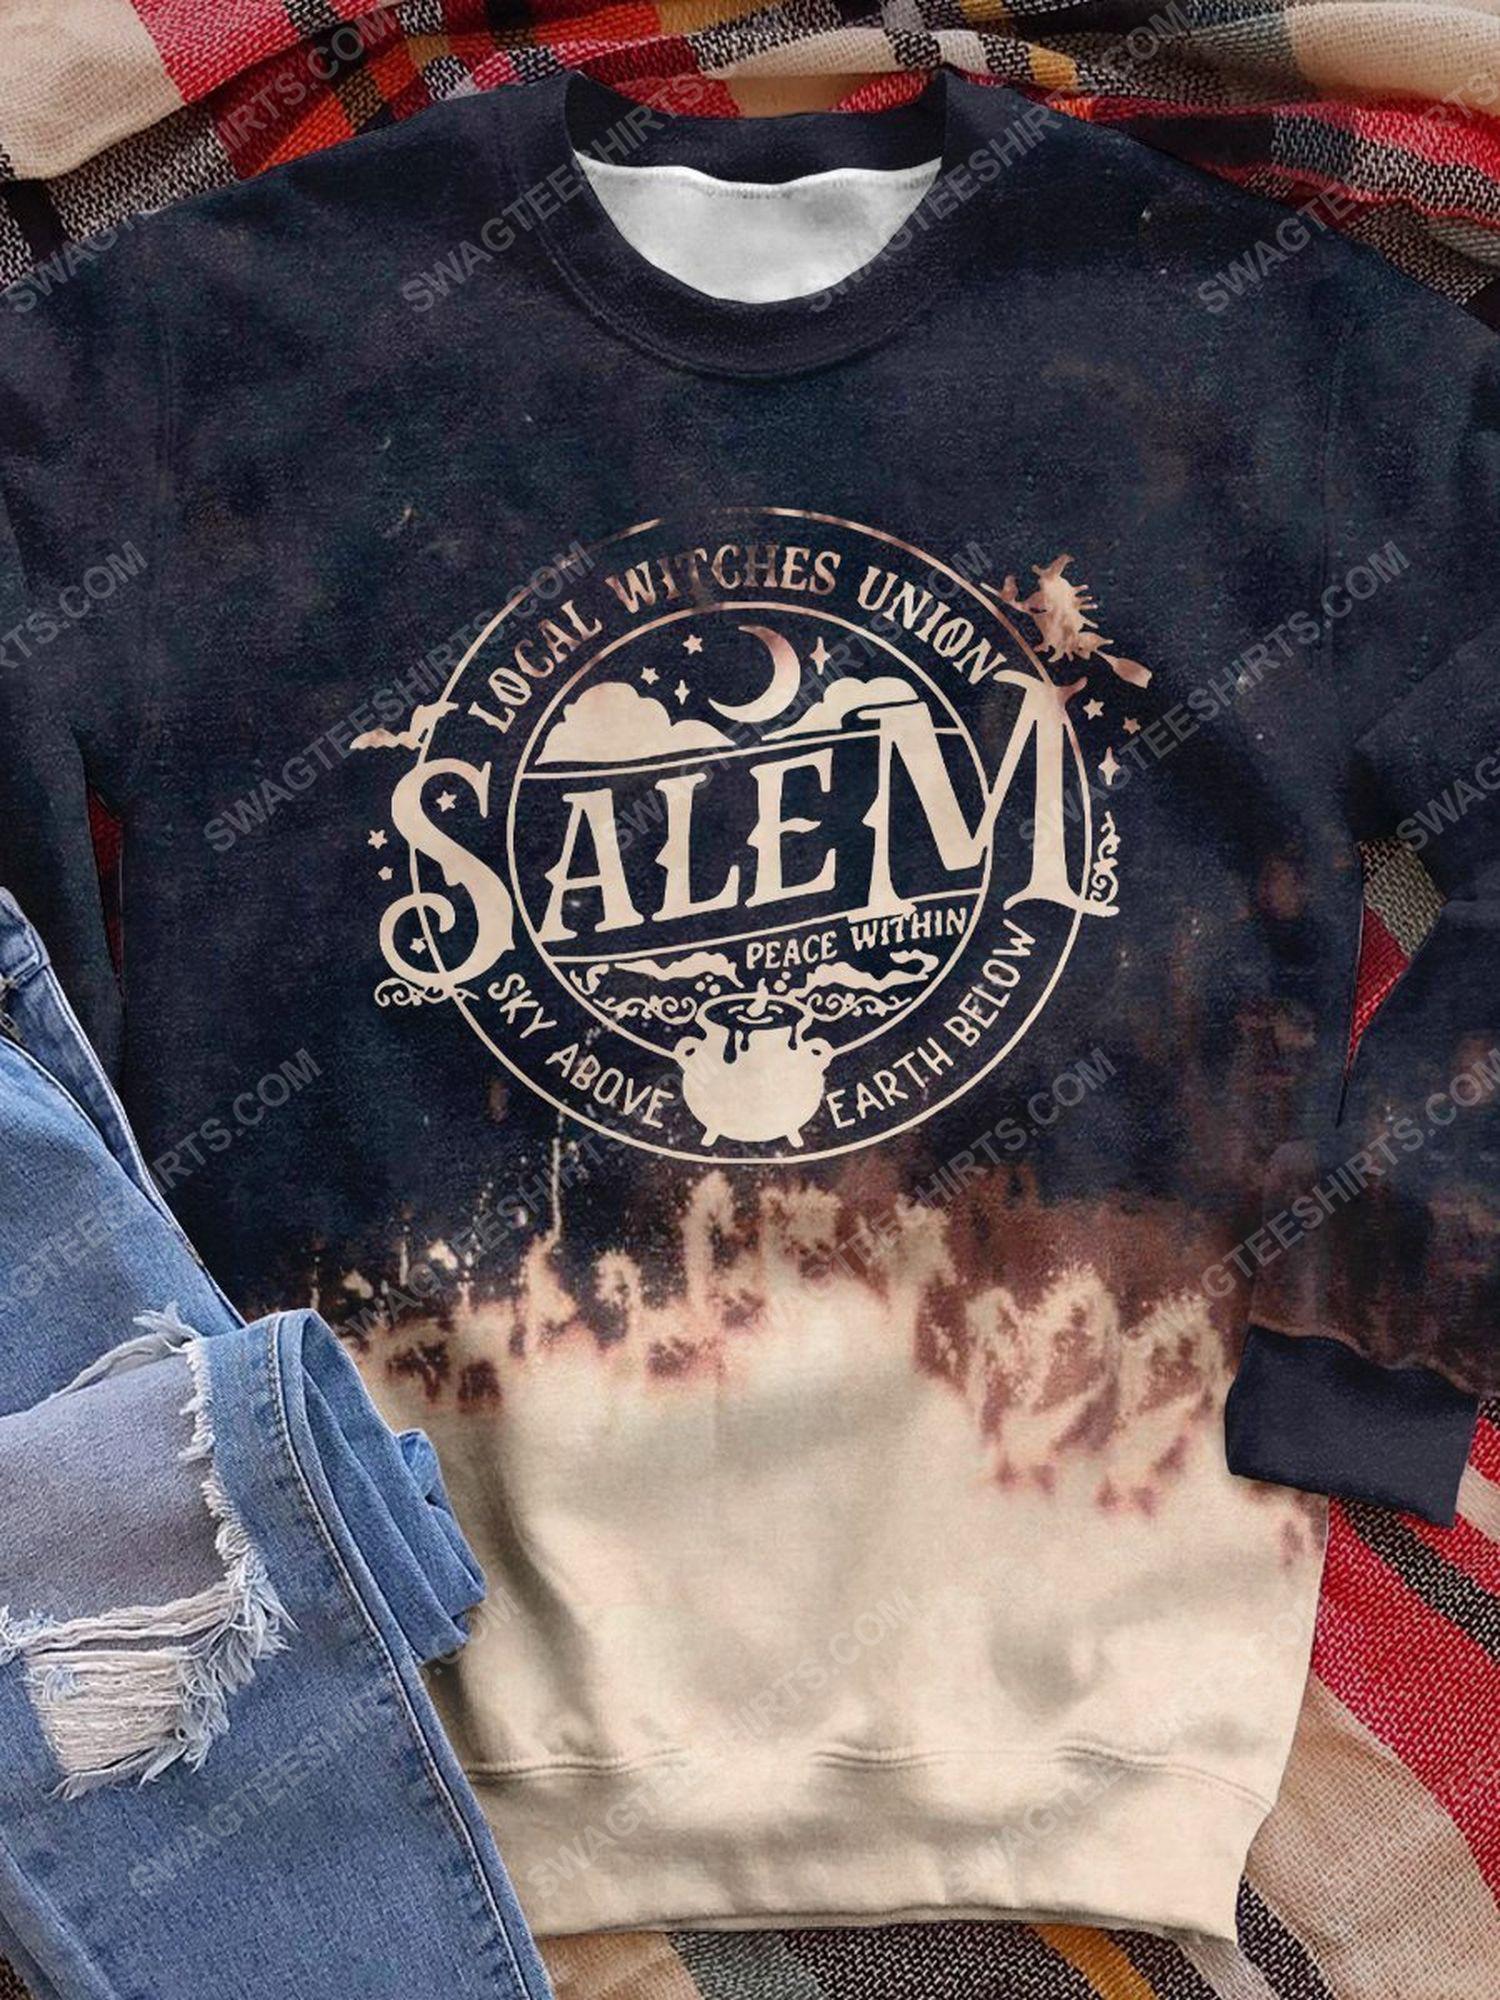 Halloween night local witches union salem shirt 1 - Copy (3)